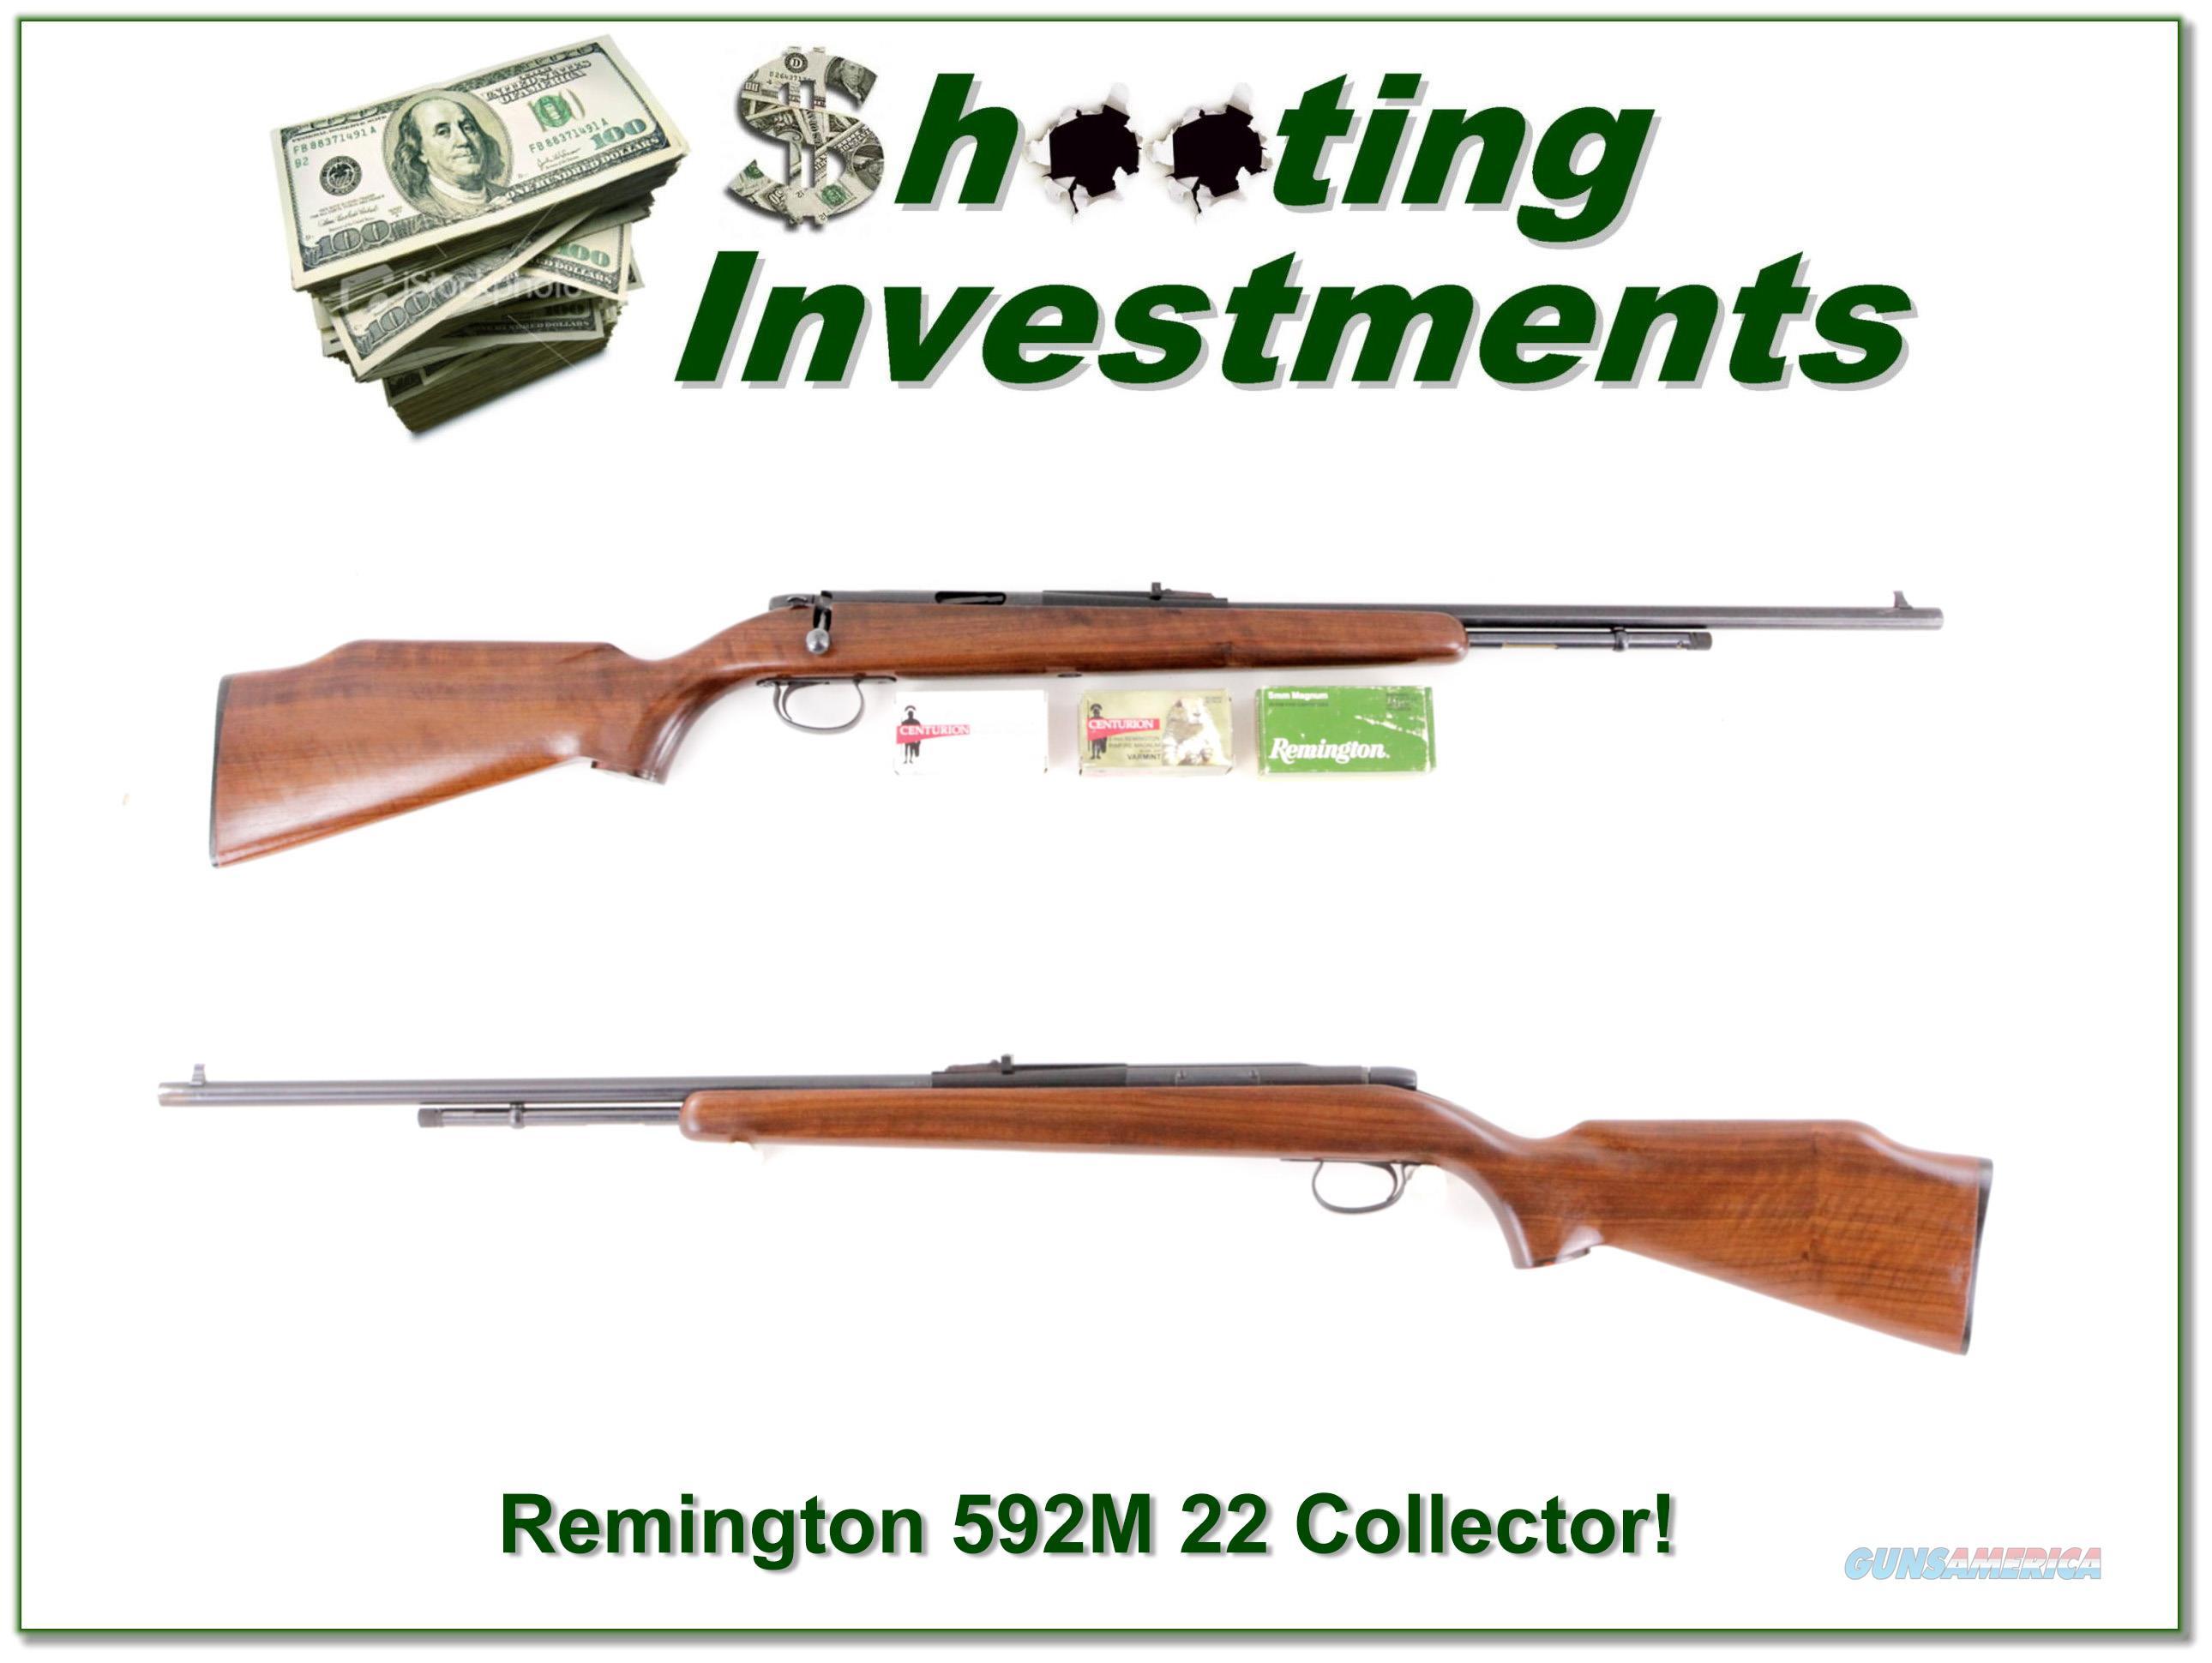 Remington 592M 5mm Remington Magnum!  Guns > Rifles > Remington Rifles - Modern > .22 Rimfire Models